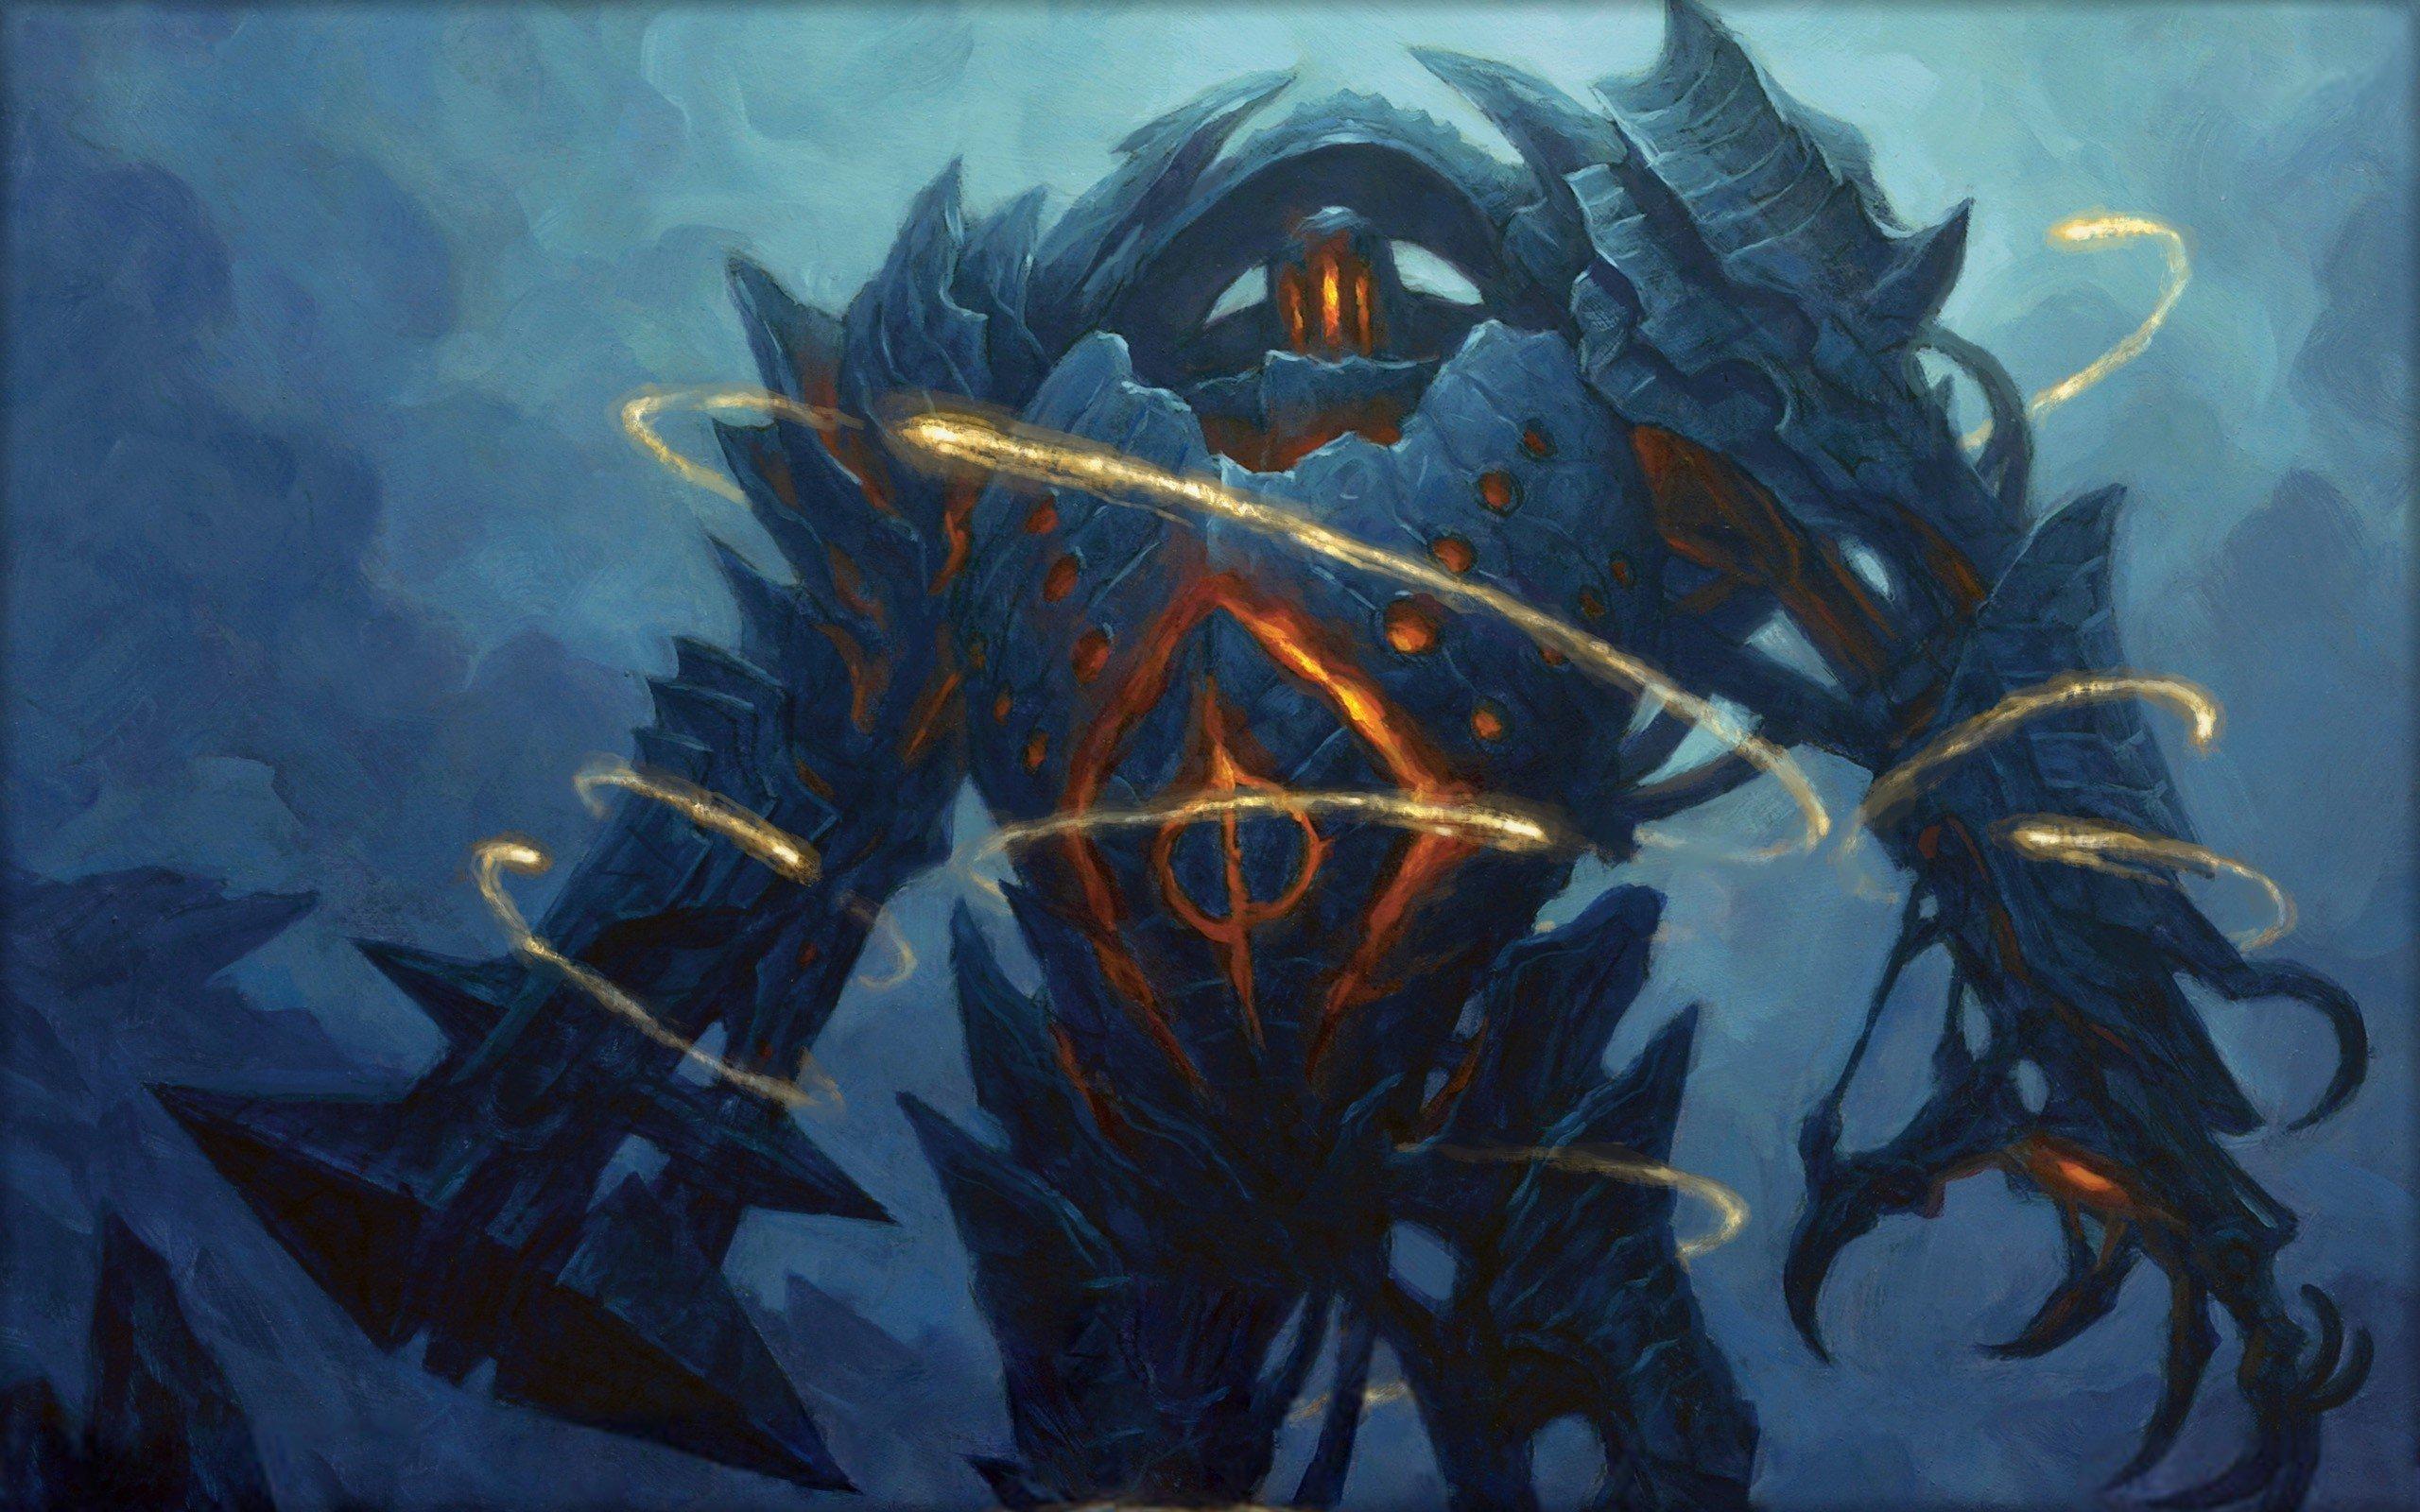 Magic The Gathering Fantasy Art Golem Wallpapers HD 2560x1600